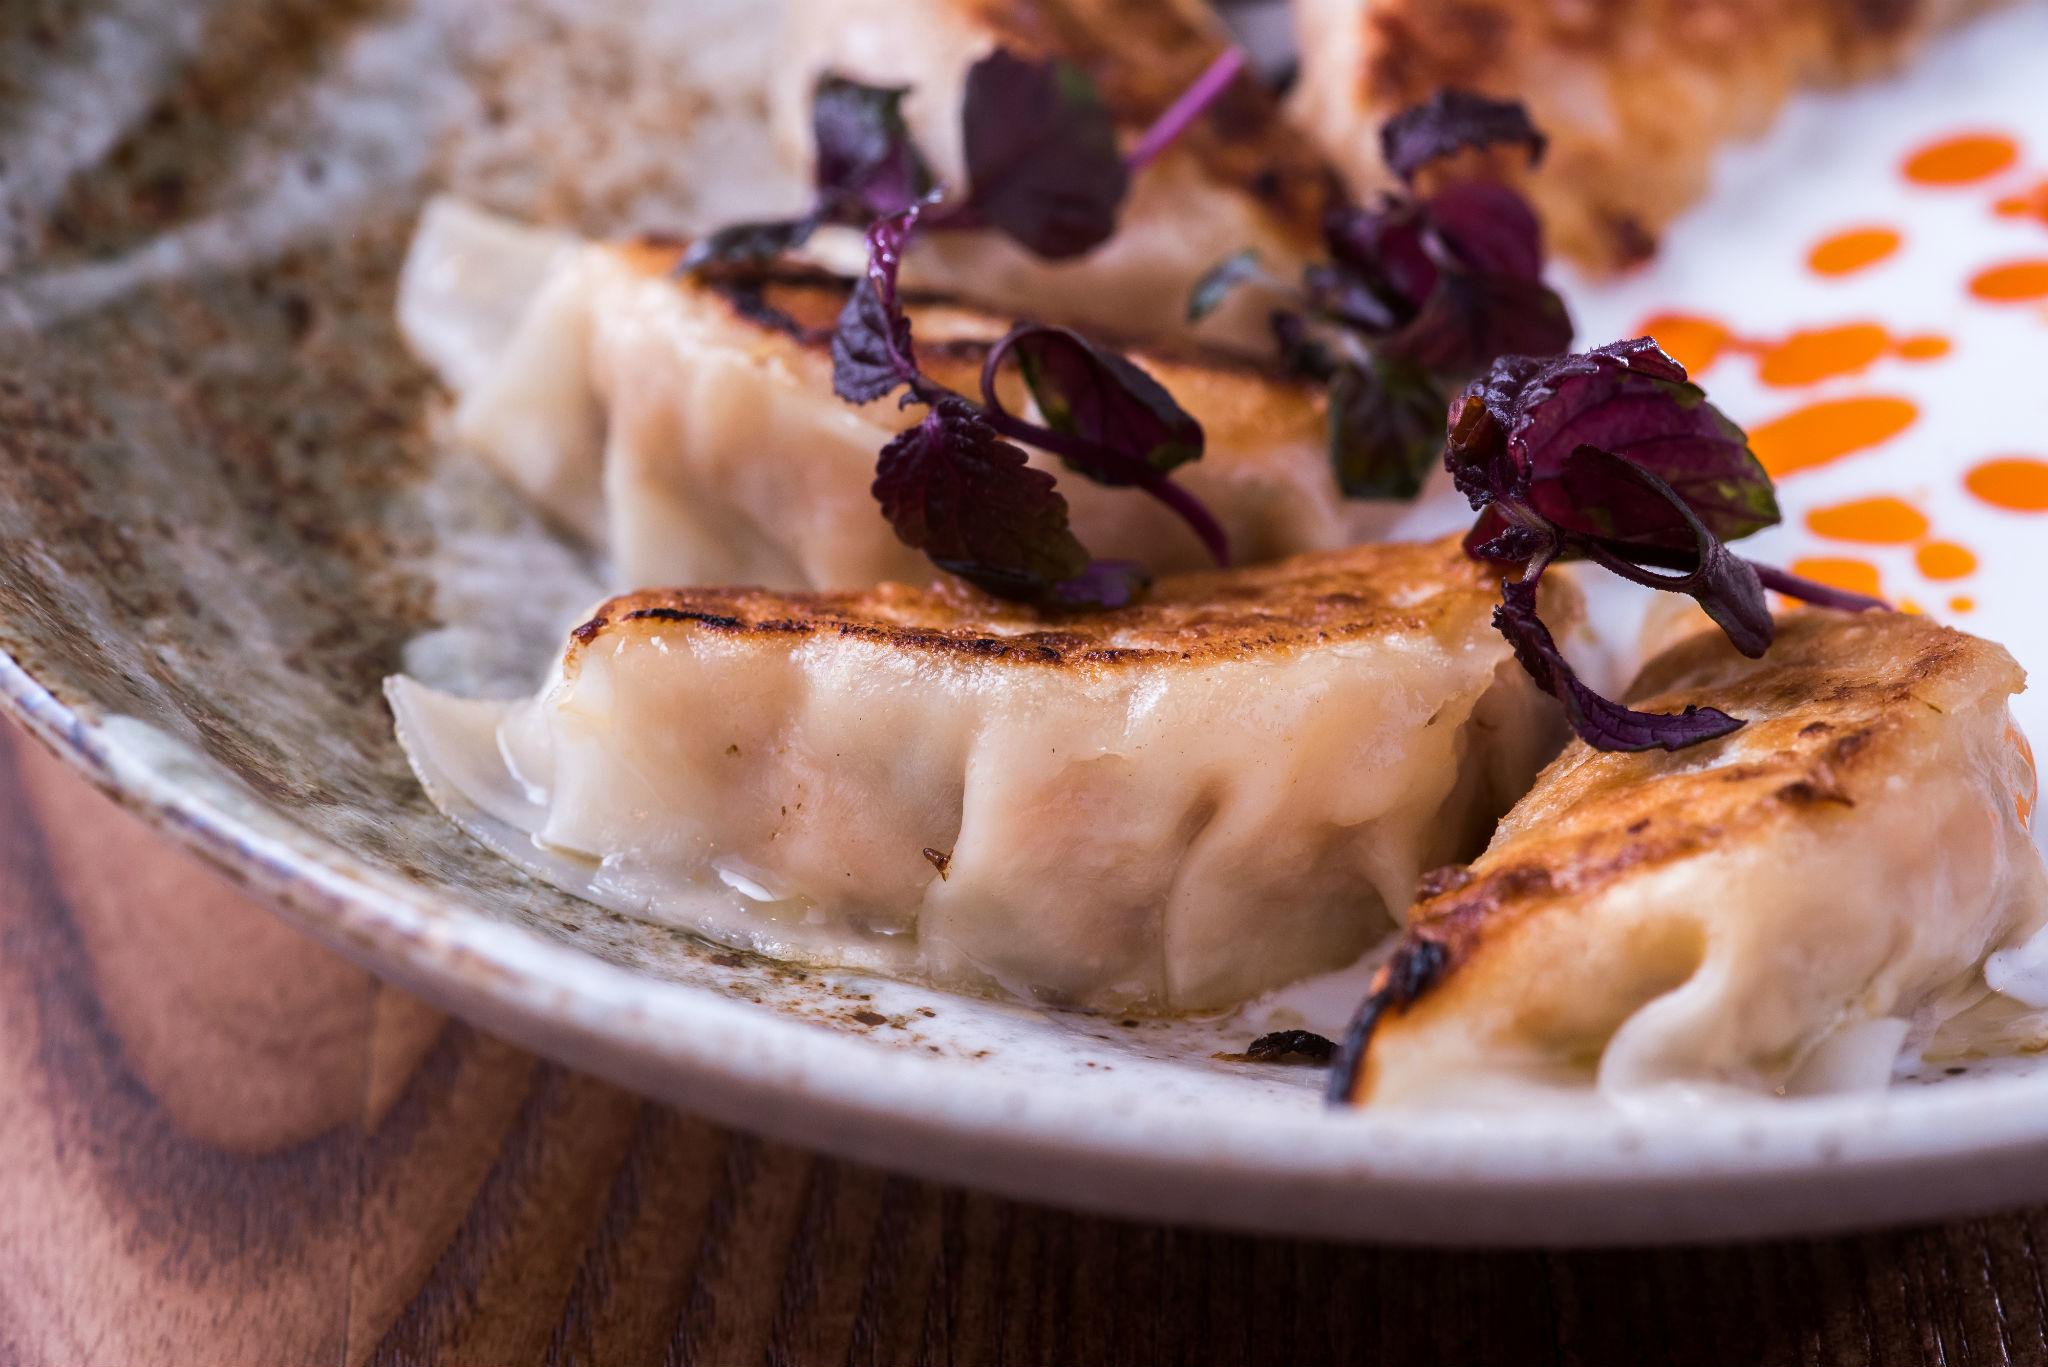 london's best dumplings, gyoza bar